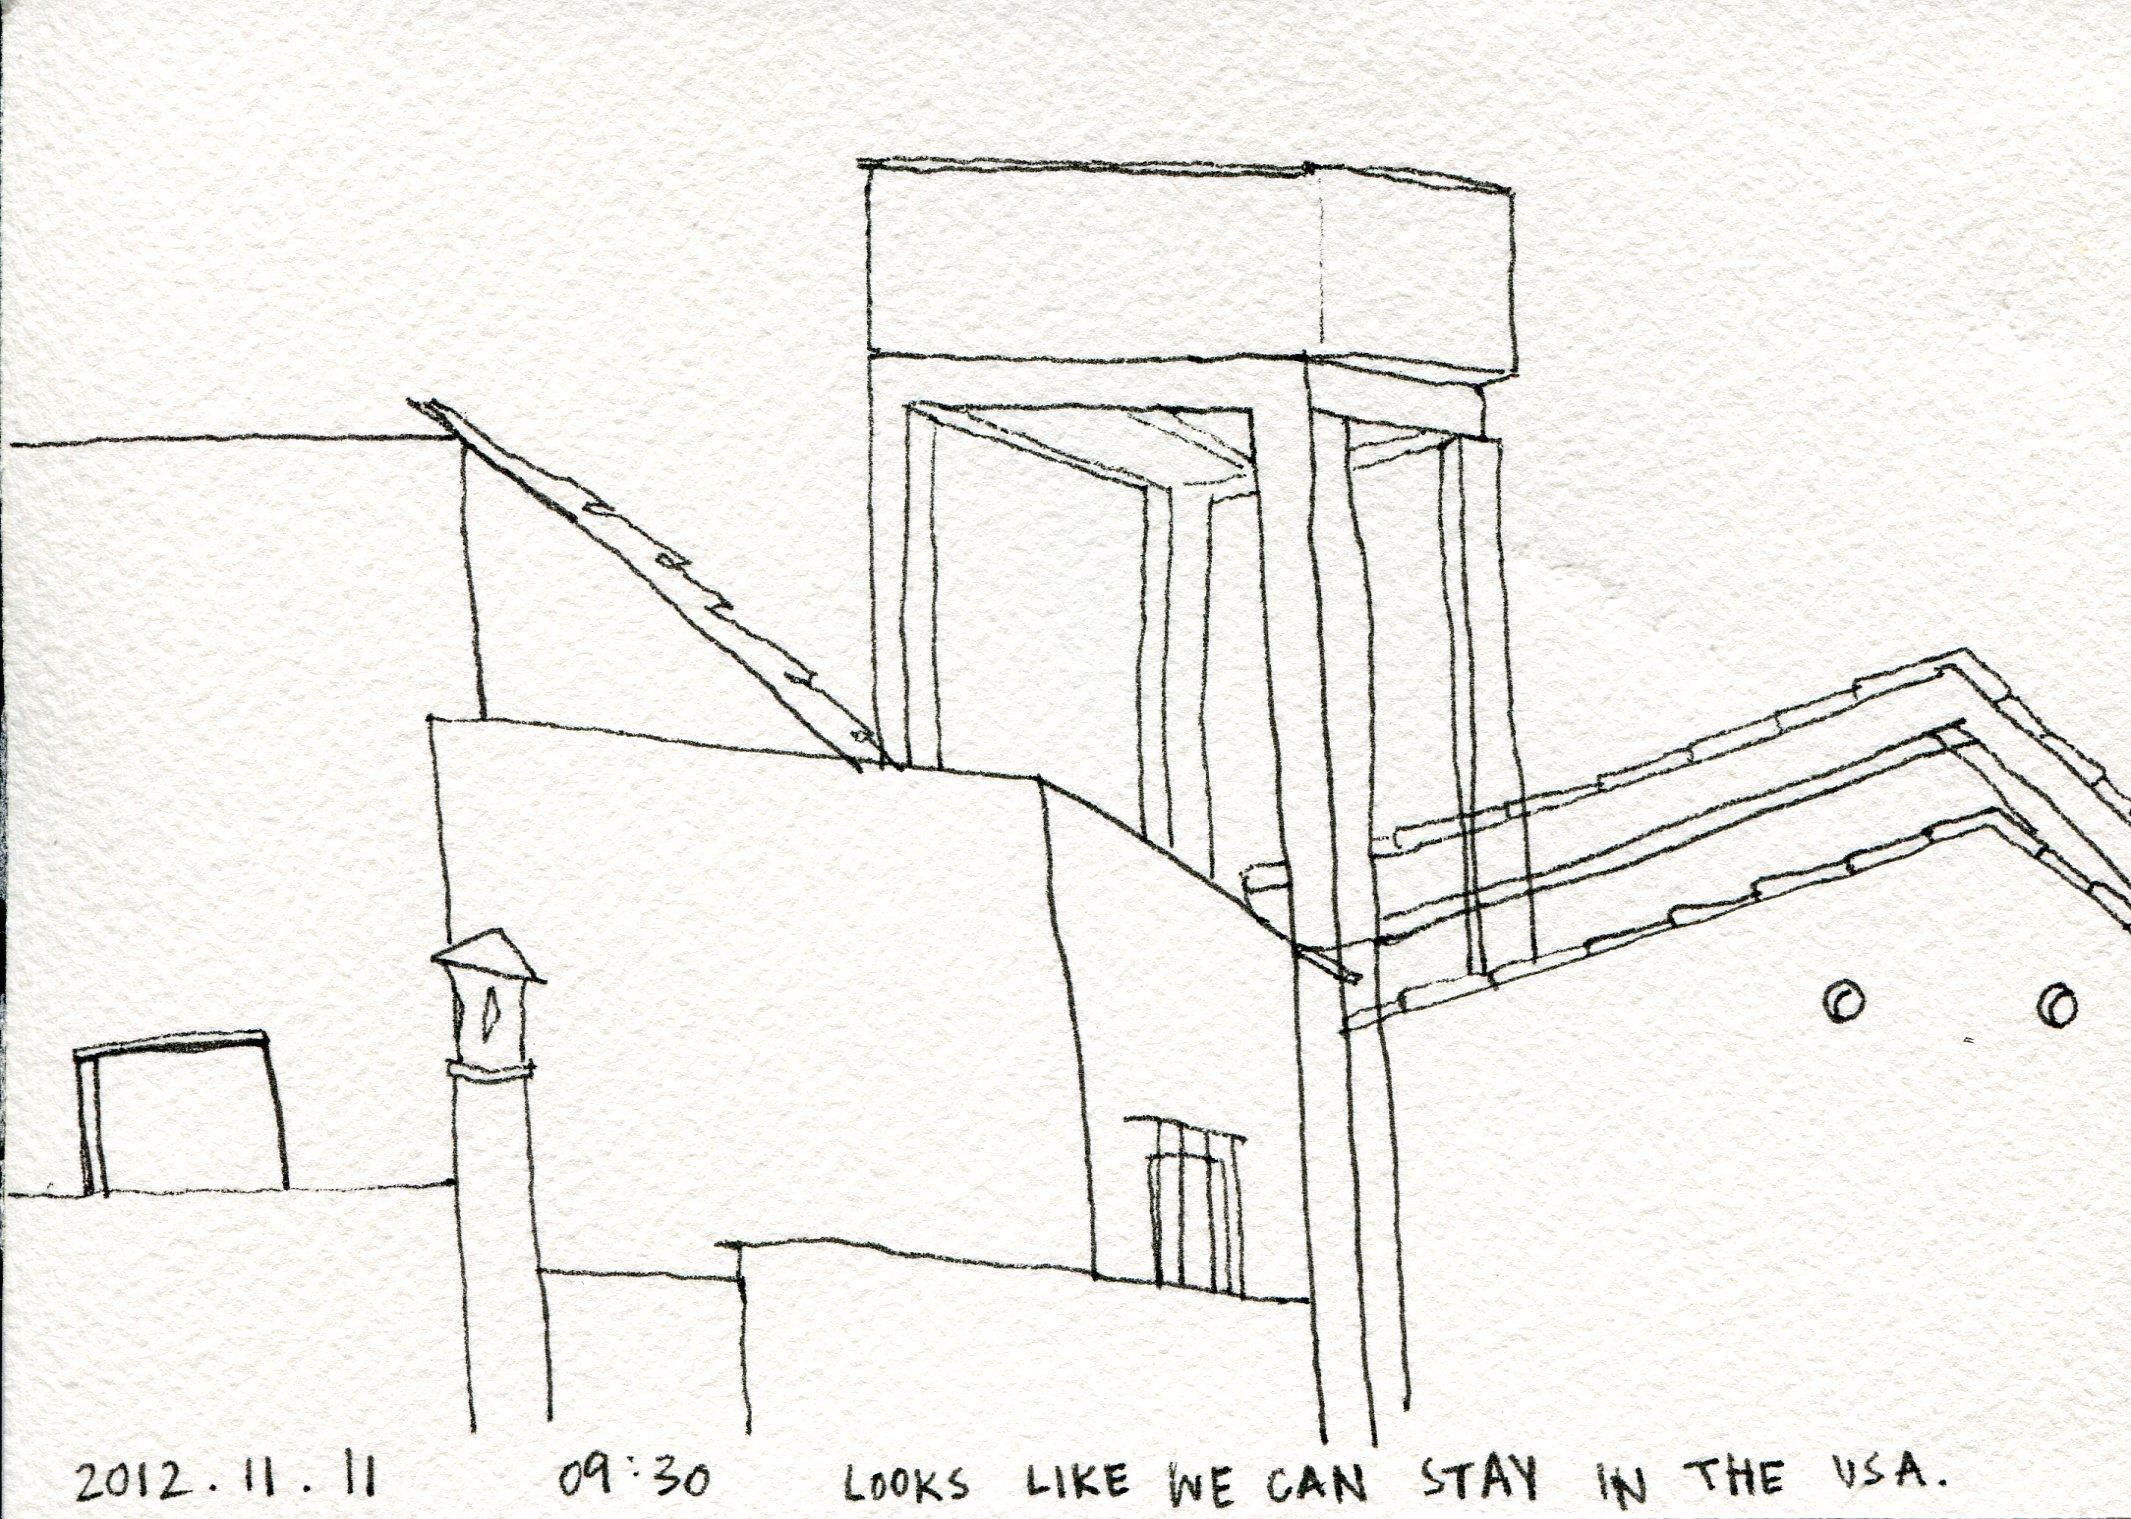 2012-11-18 drawing007.jpg